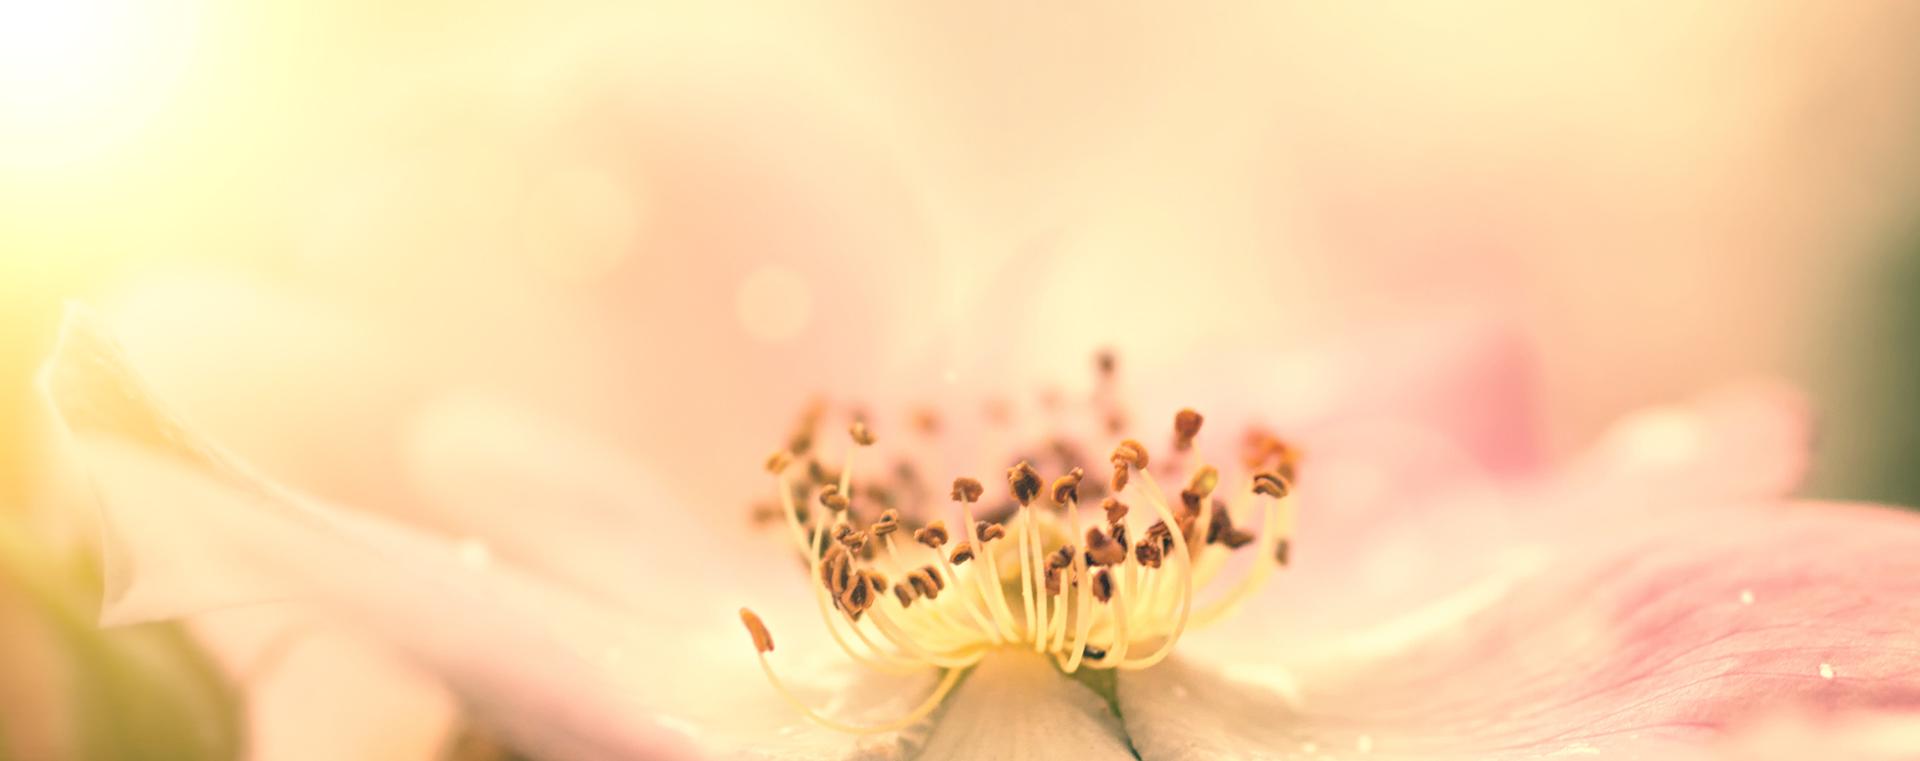 Wild Rose Heckenrose Desinteresse an der Gegenwart Lemon Pharma Original Bachblüten